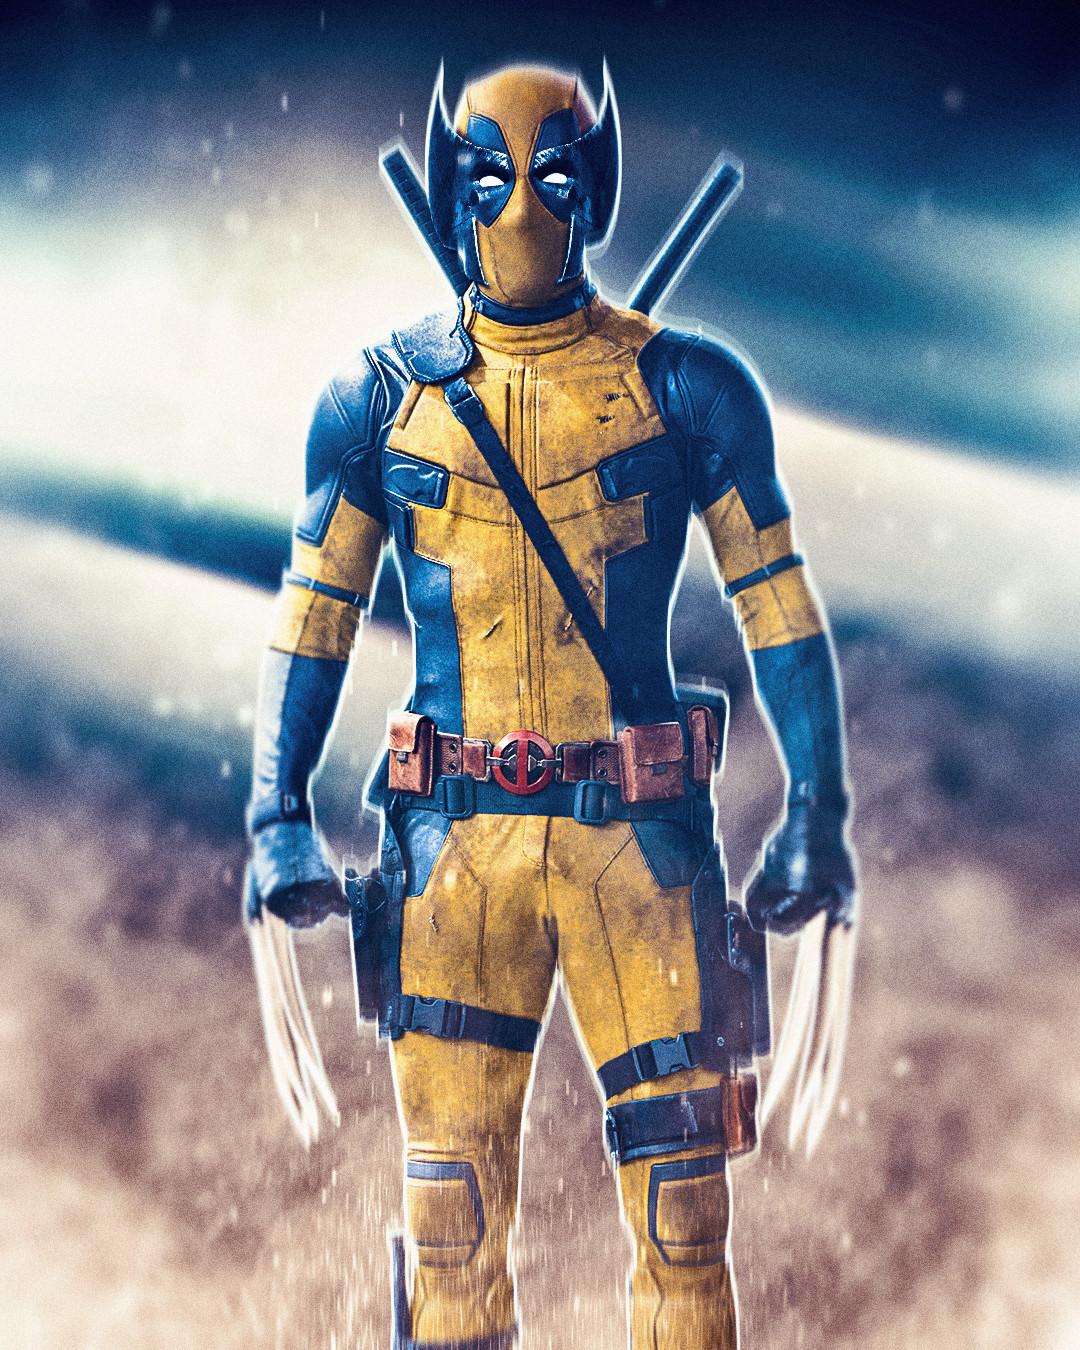 Deadpool x Wolverine mashup